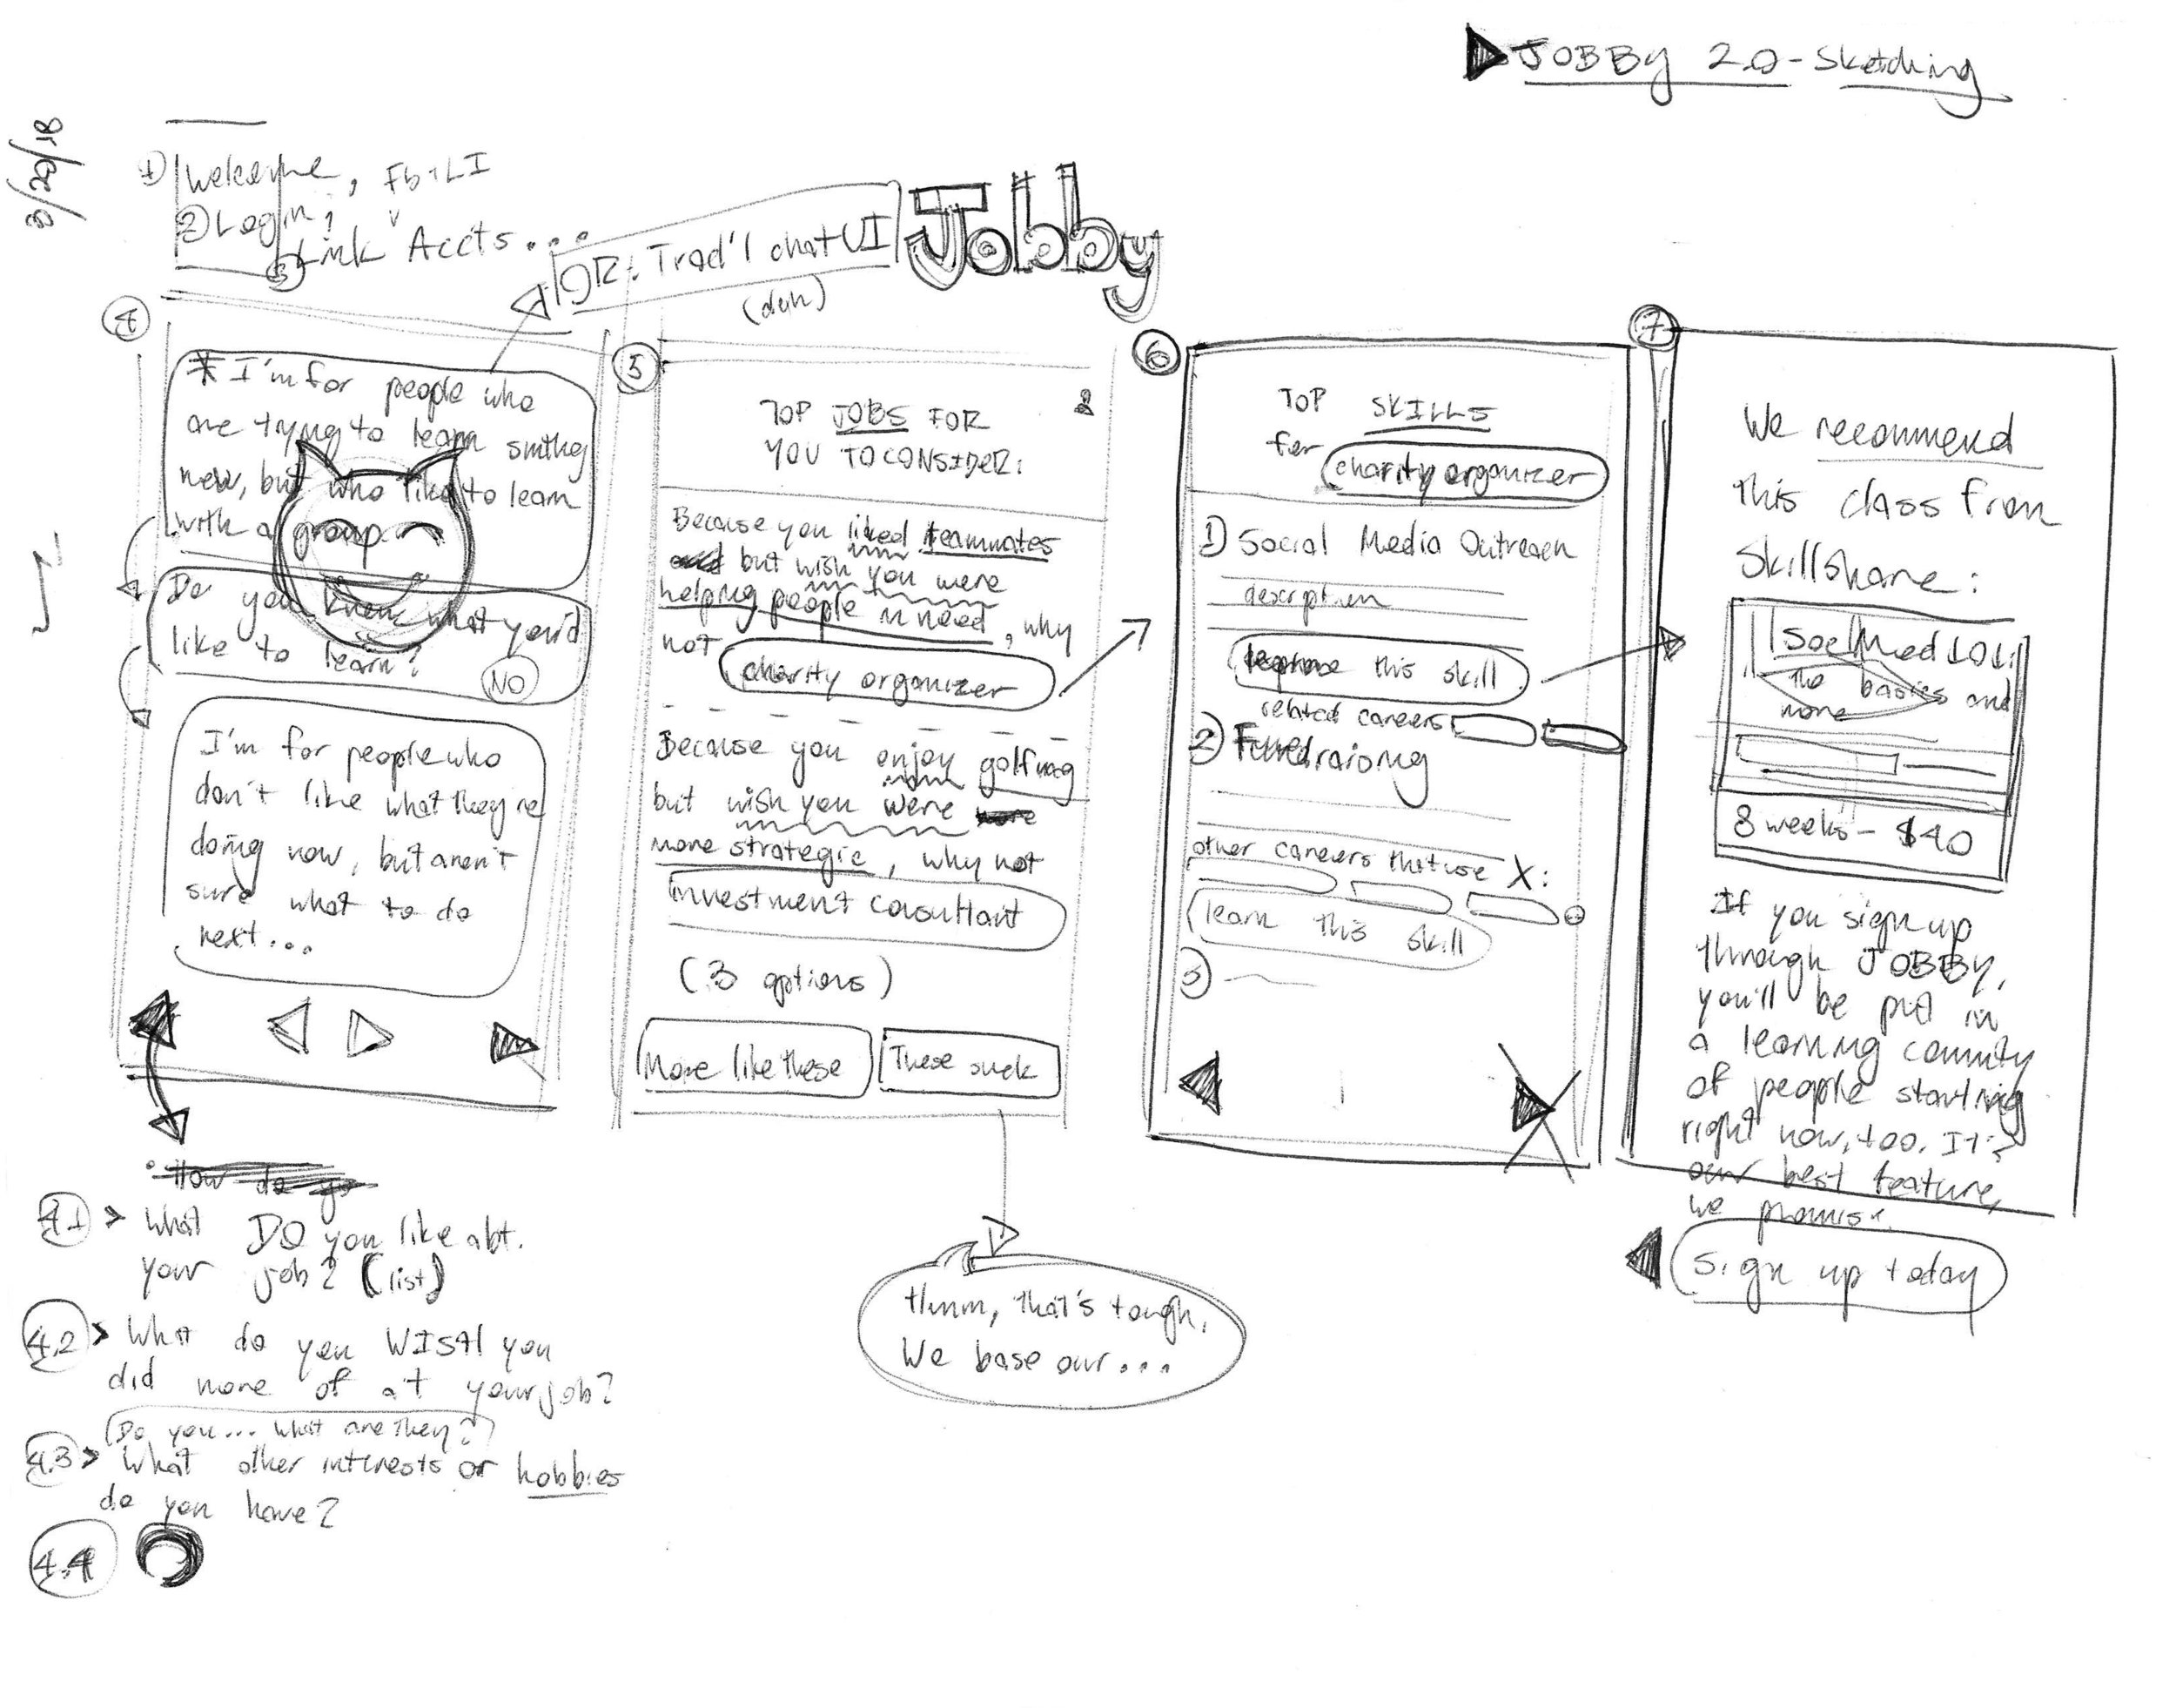 Classmates - Page 1.jpg